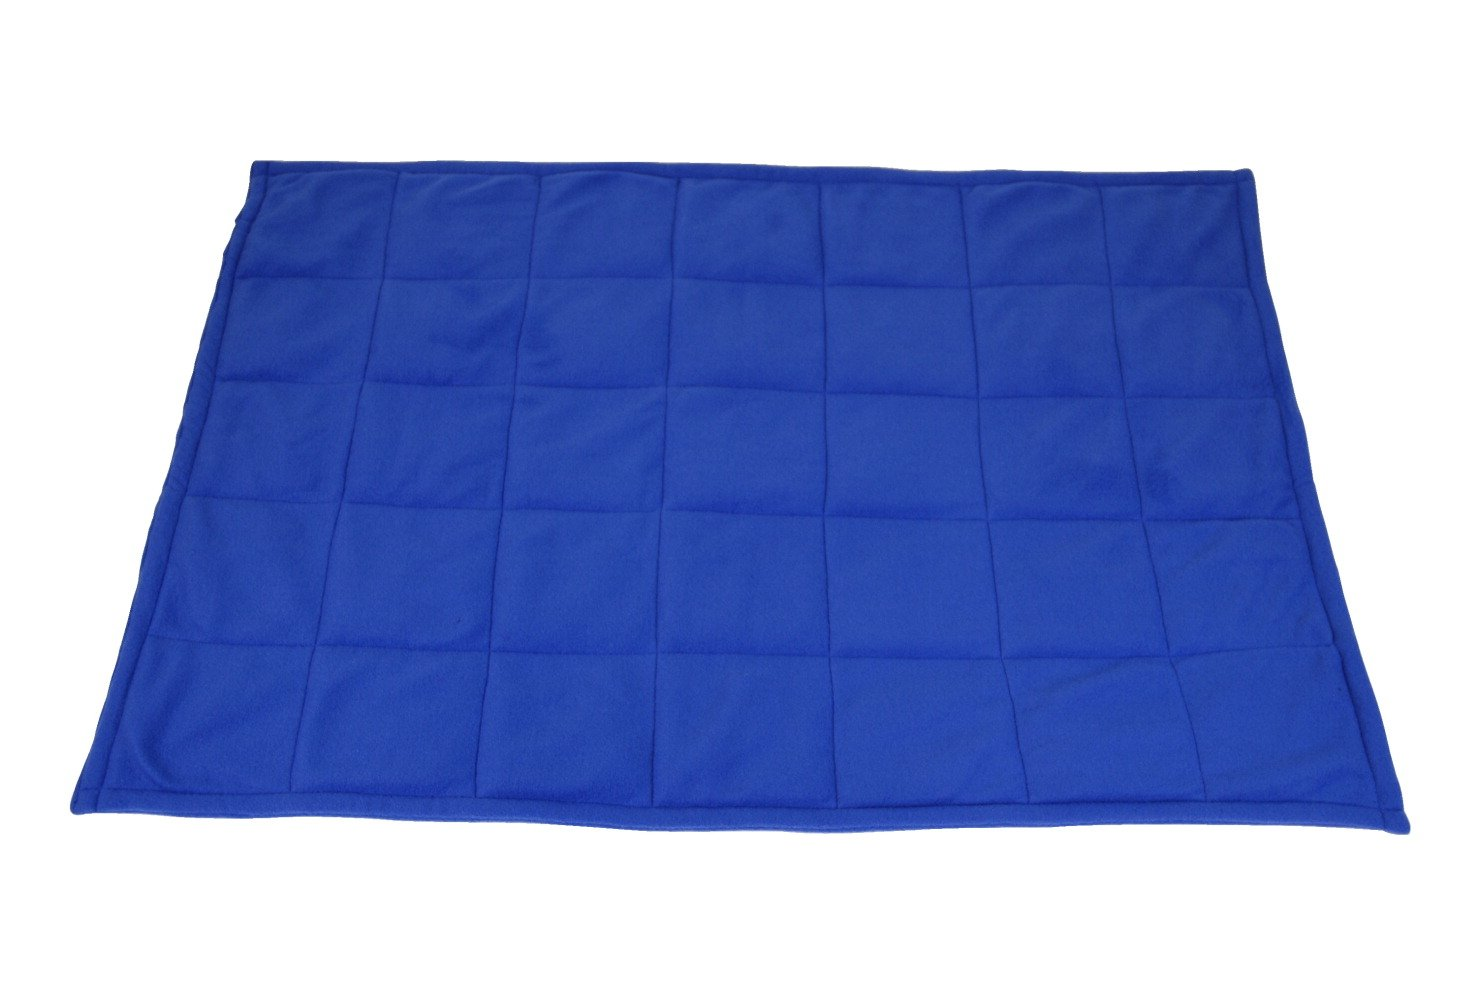 Abilitations Fleece Weighted Blanket, Medium, Blue